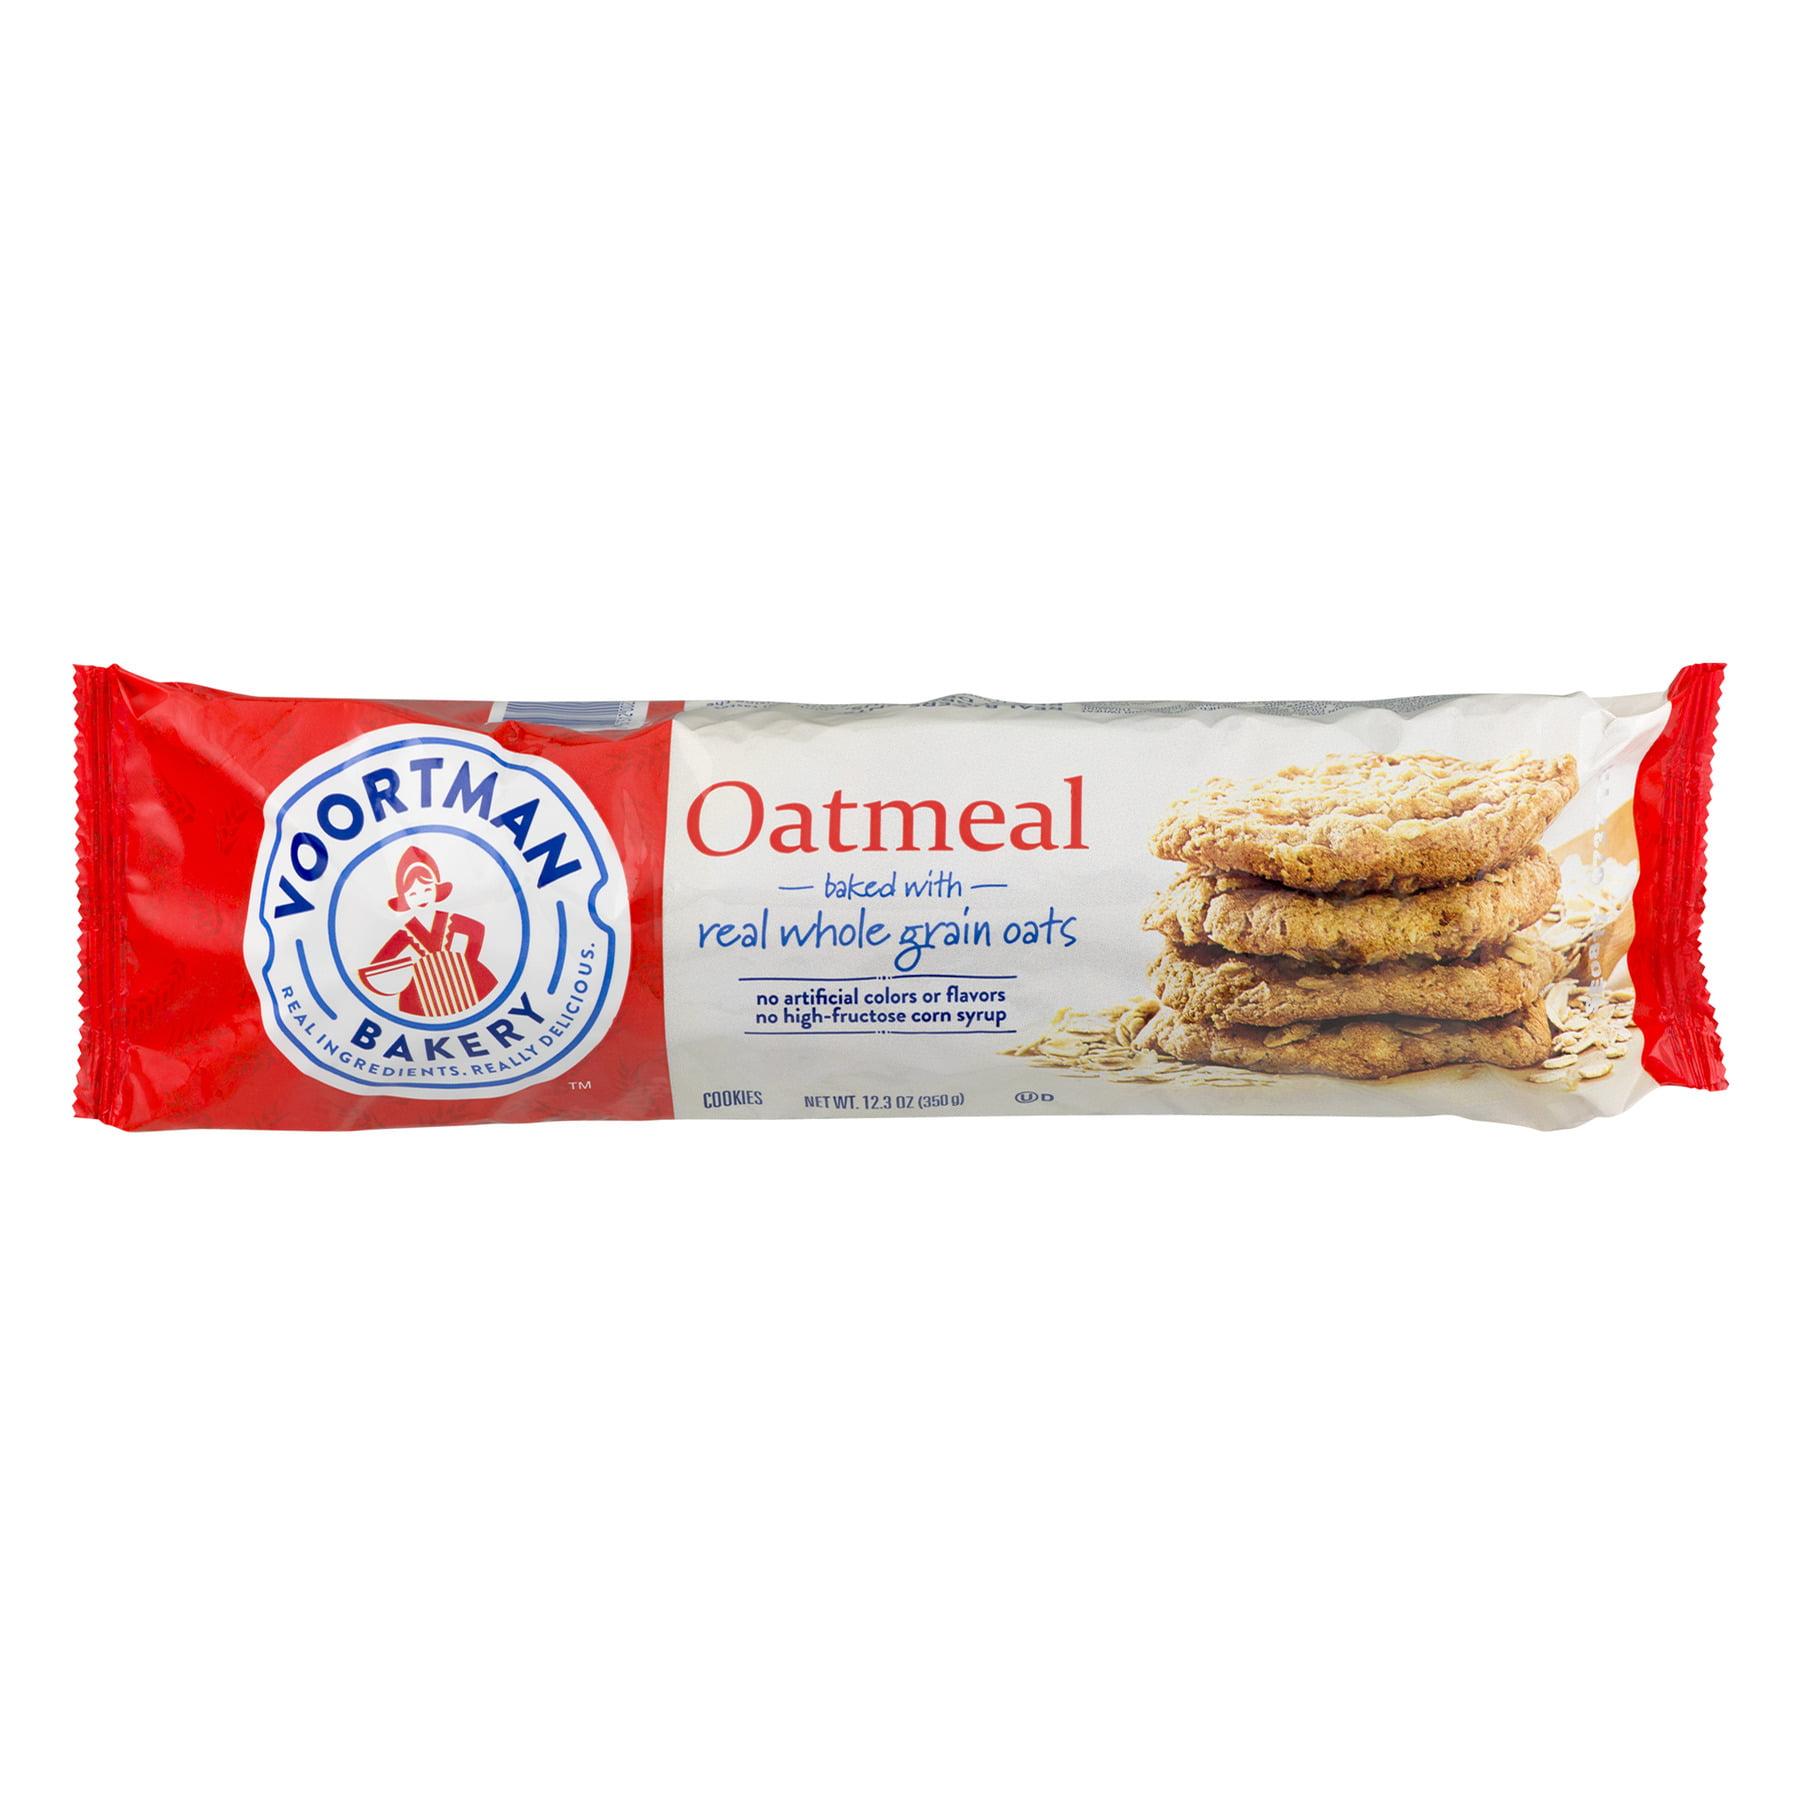 Voortman Bakery Oatmeal Cookies, 12.3 Oz.